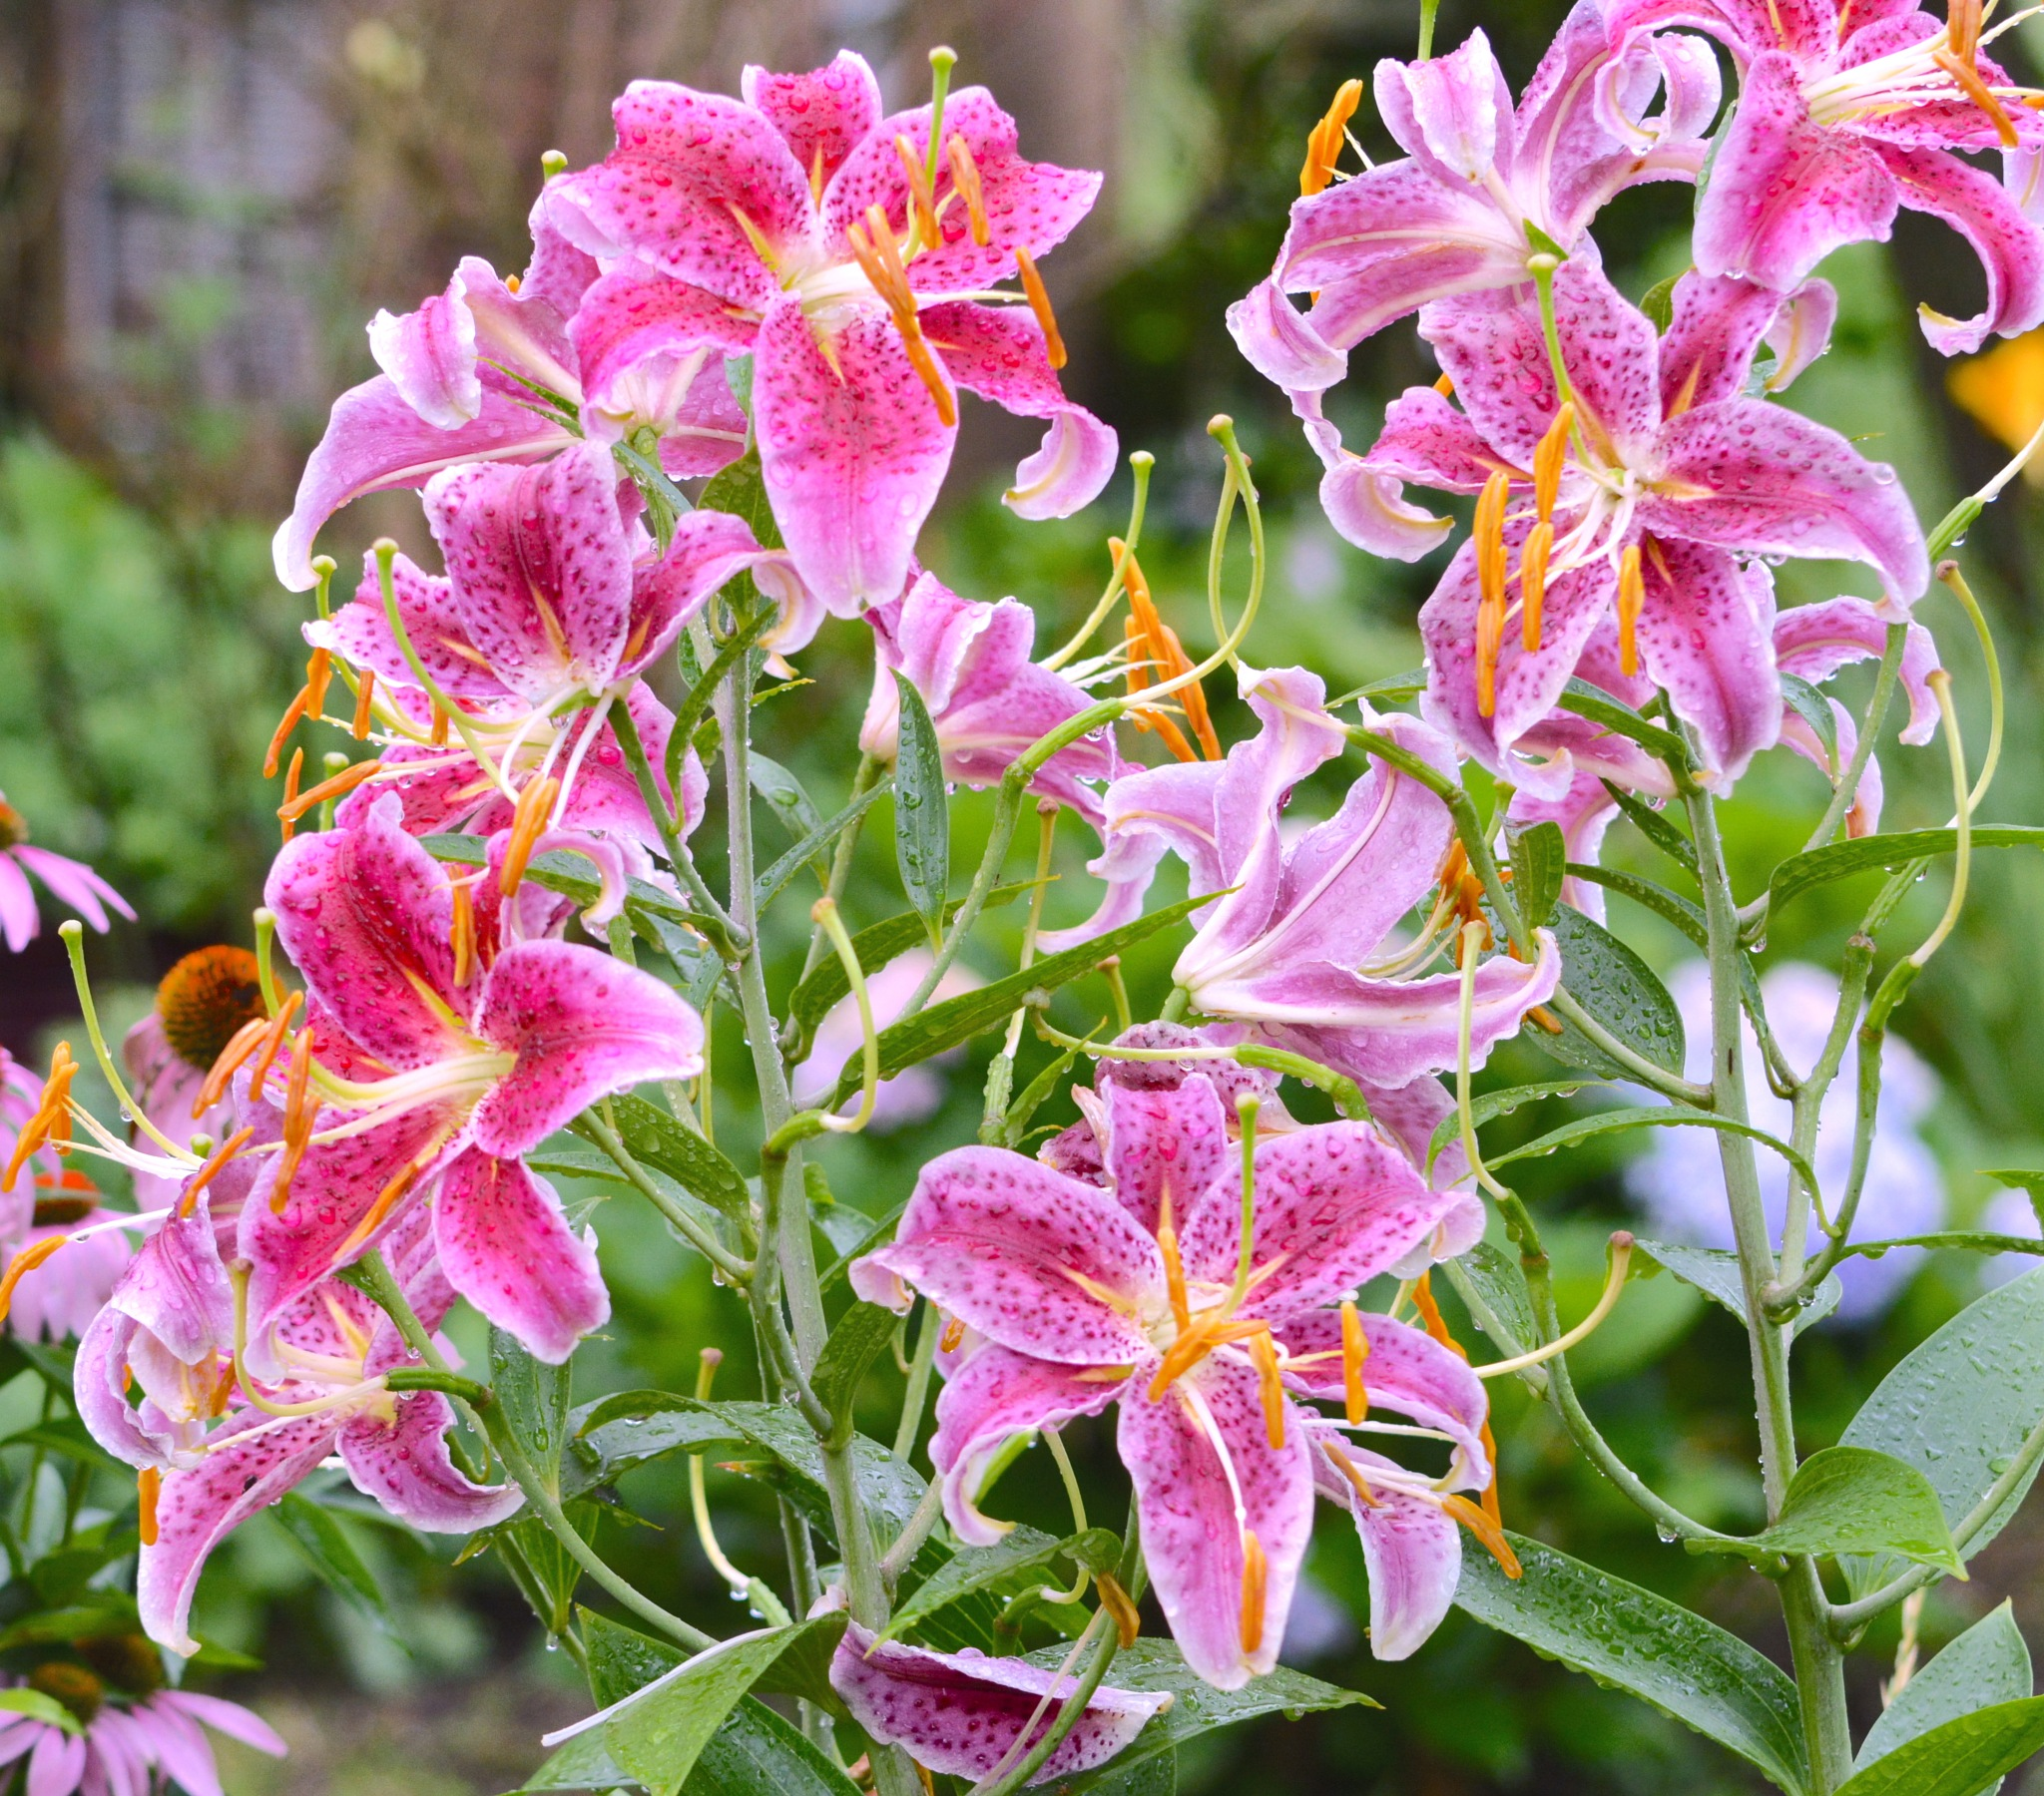 Fuchsia Oriental Lilies by suzanne.kohr